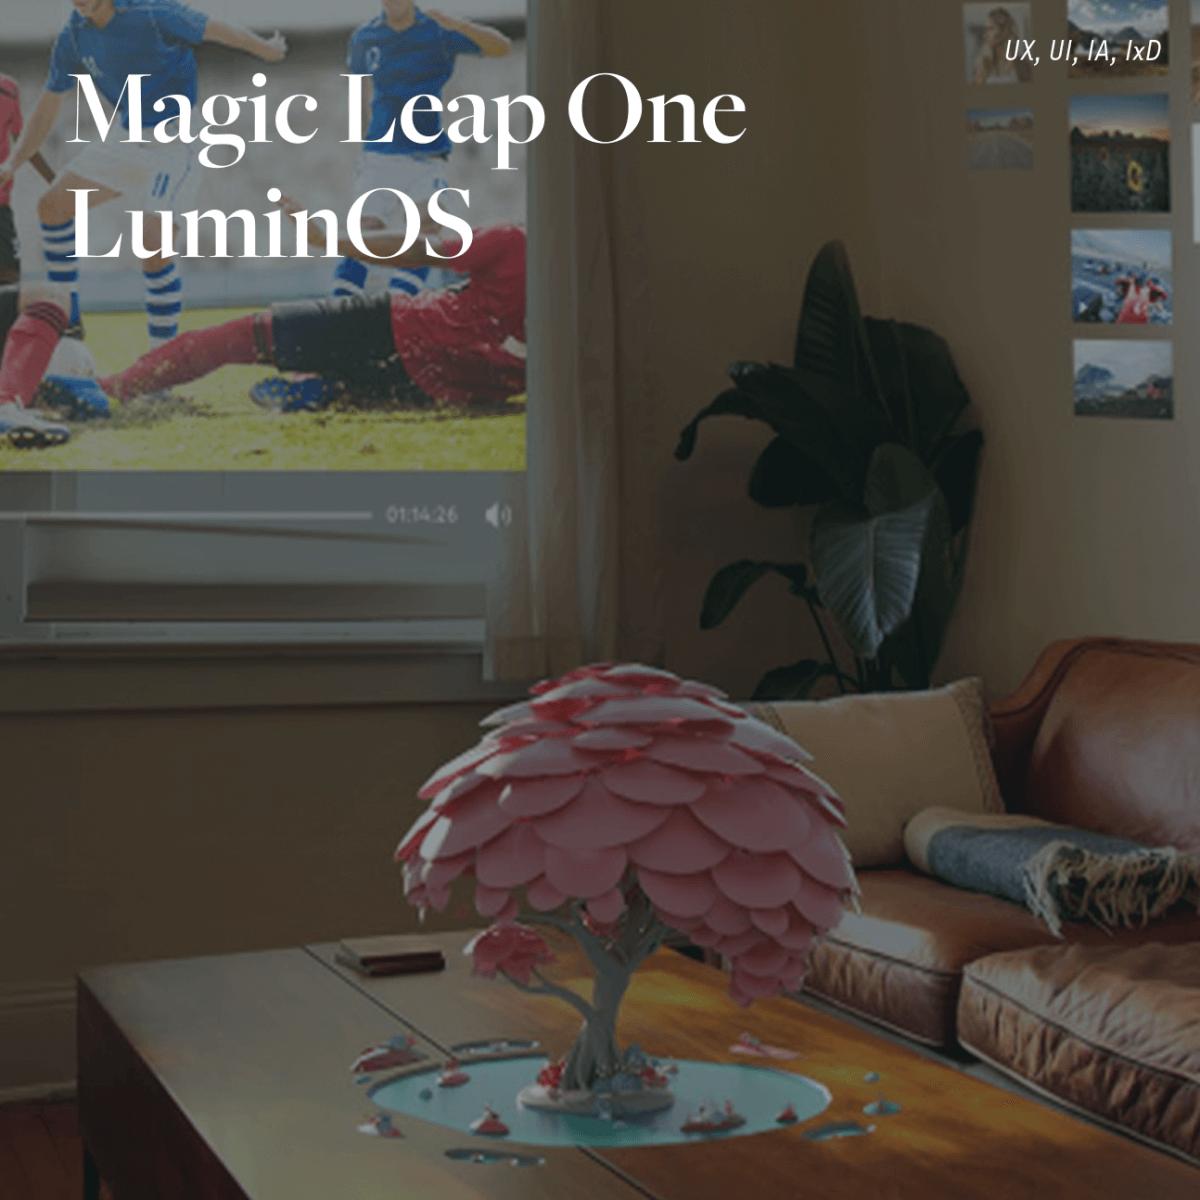 Magic Leap One / LuminOS